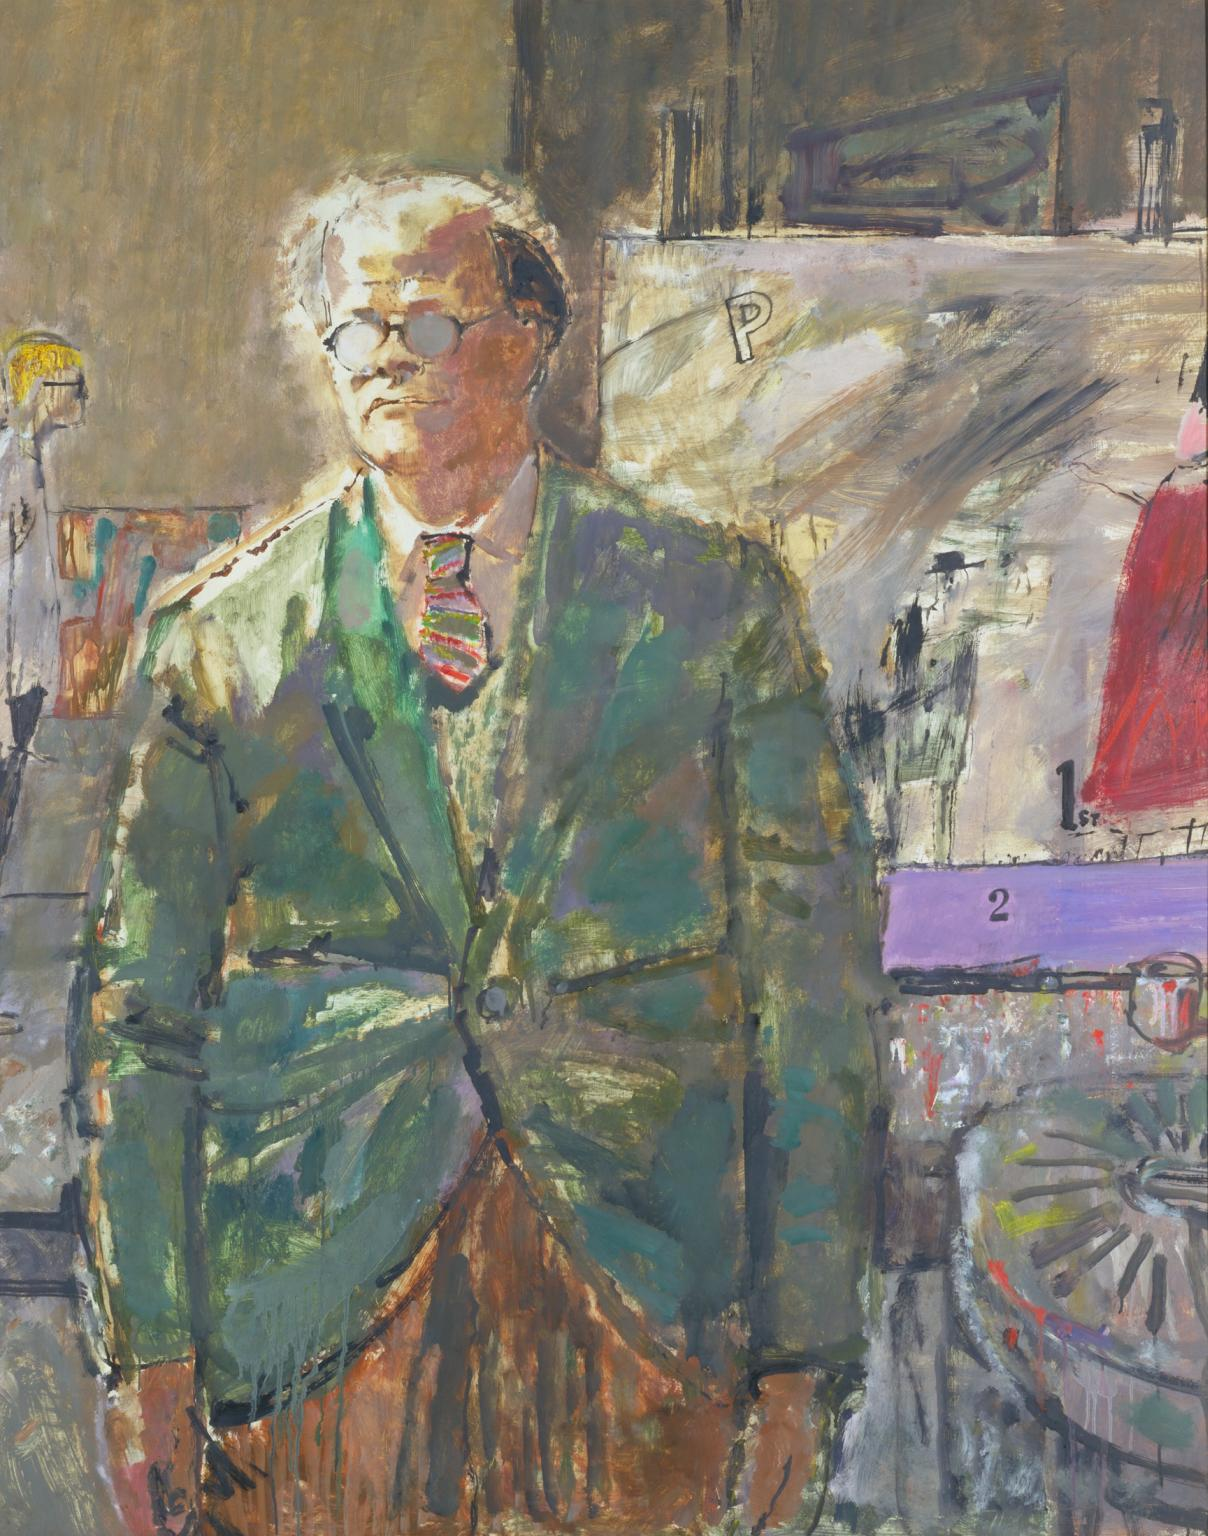 Professor Carel Weight 1961 by Ruskin Spear 1911-1990